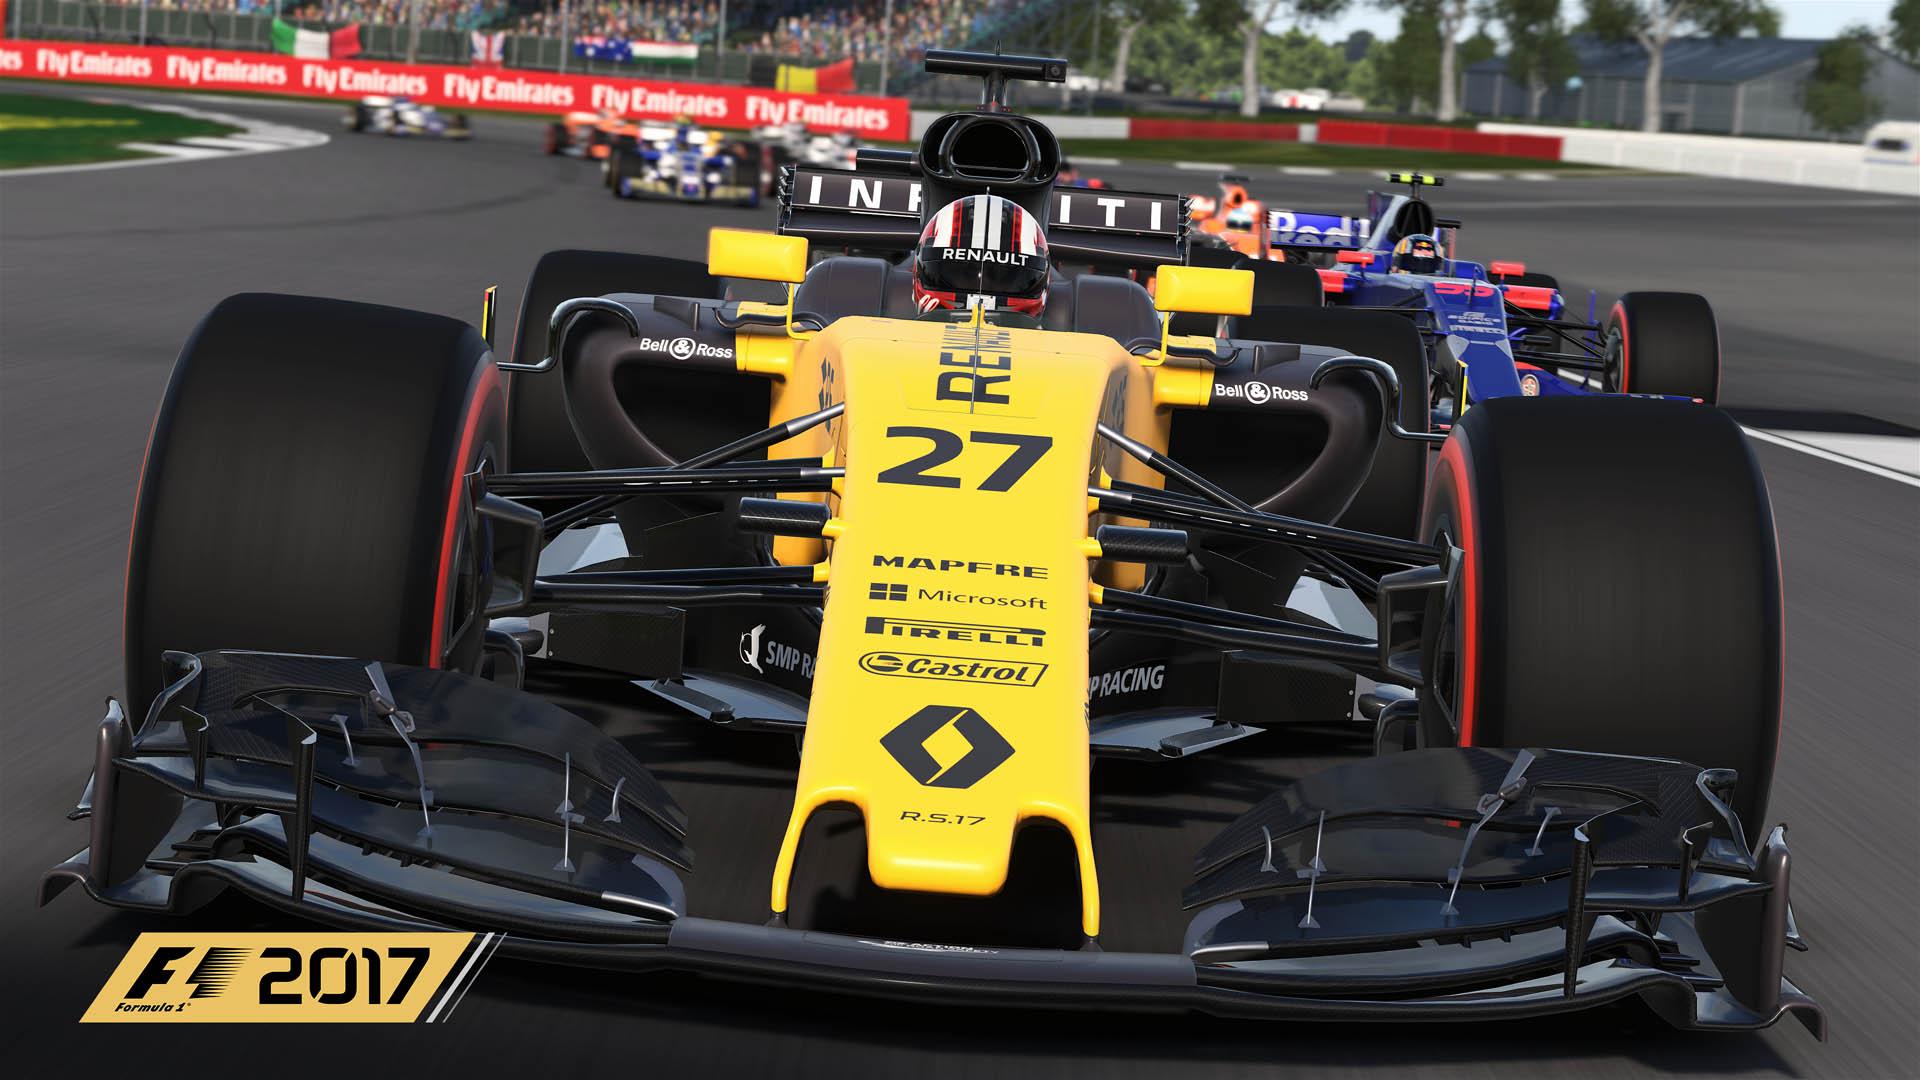 F1 2017 Updated 3.jpg